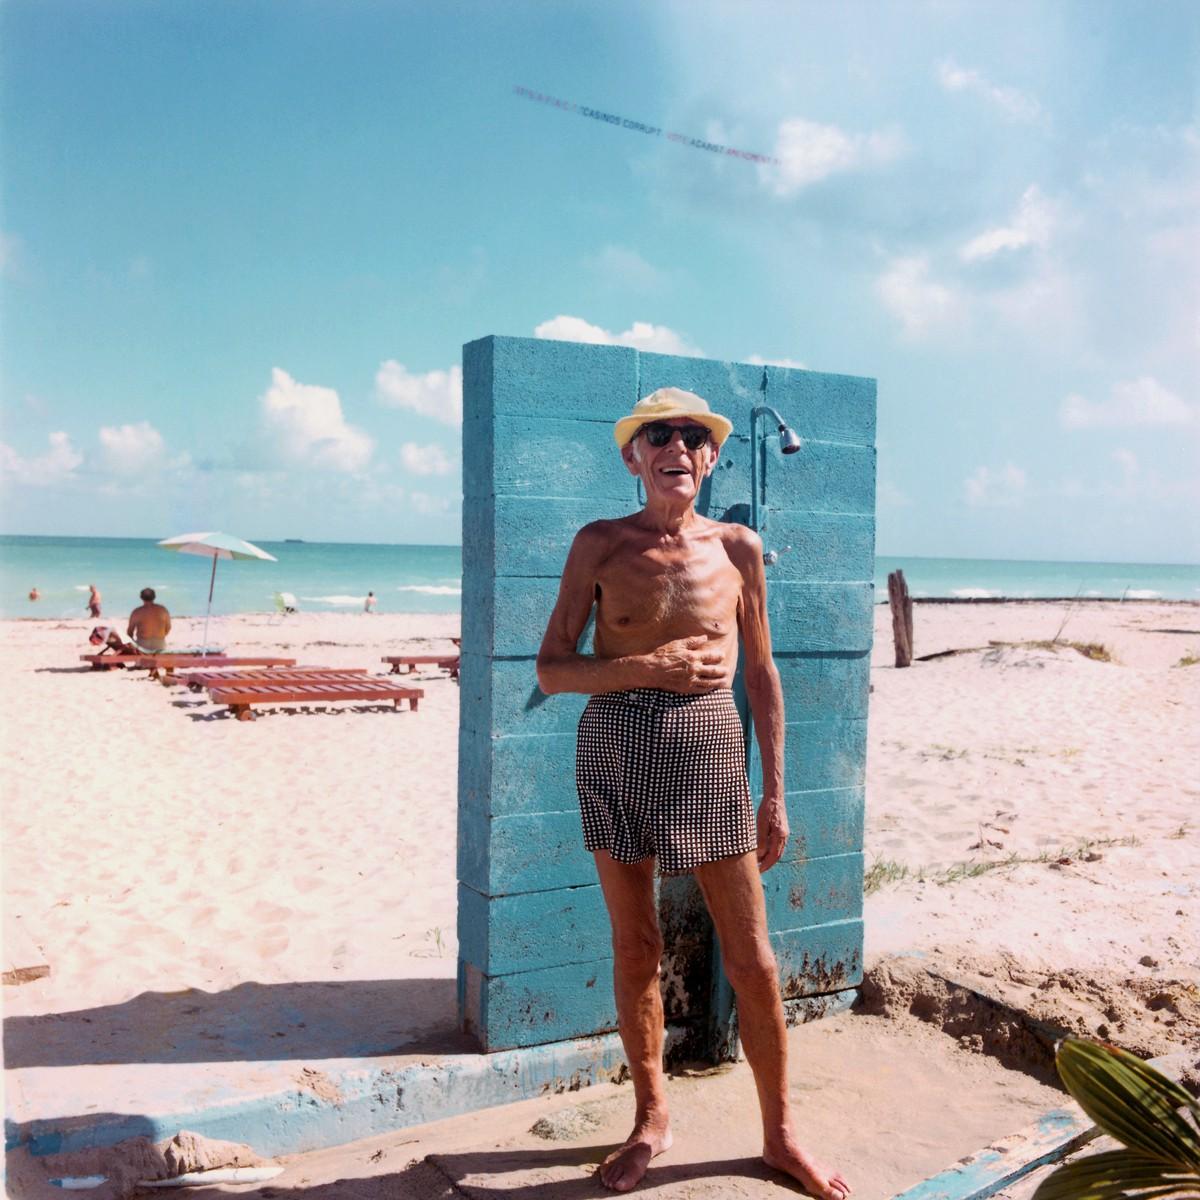 Vivid Color Photographs Show Iconic Beach Culture Of Miami